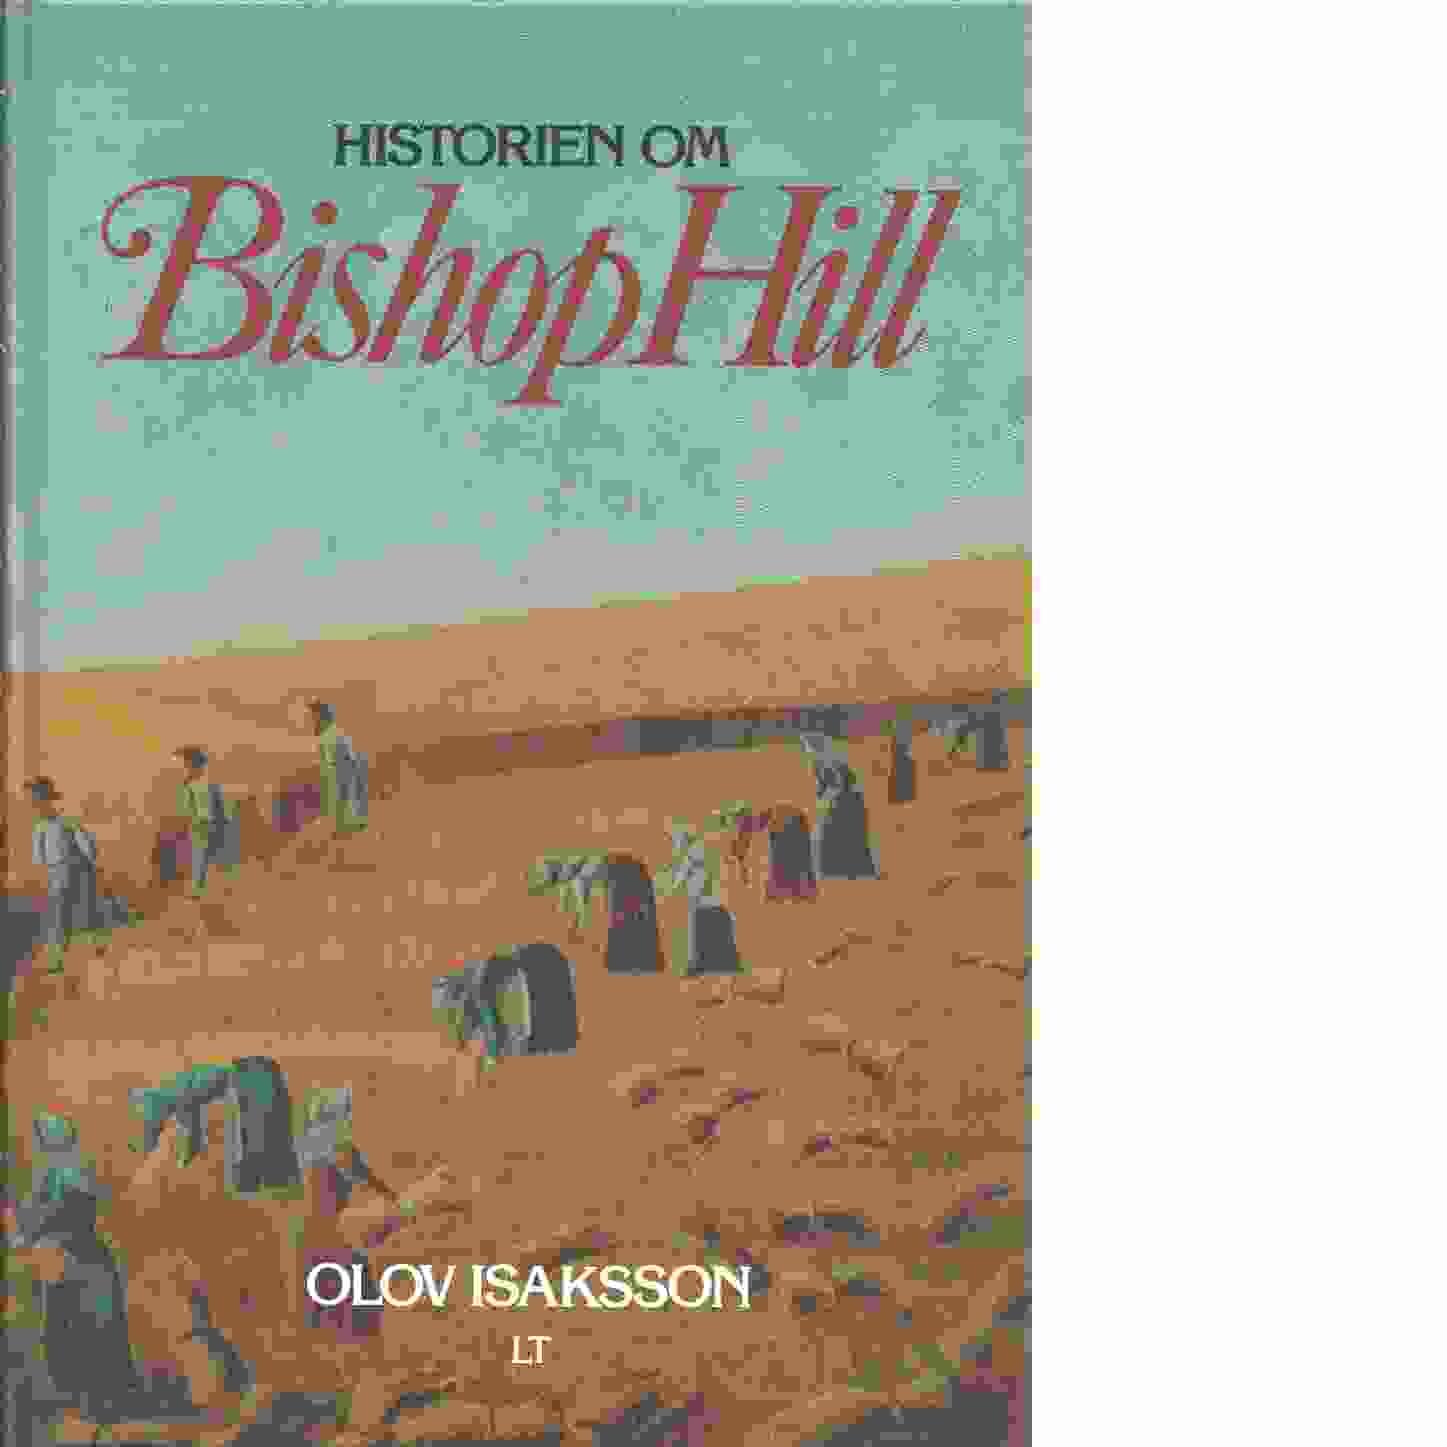 Historien om Bishop Hill - Isaksson, Olov